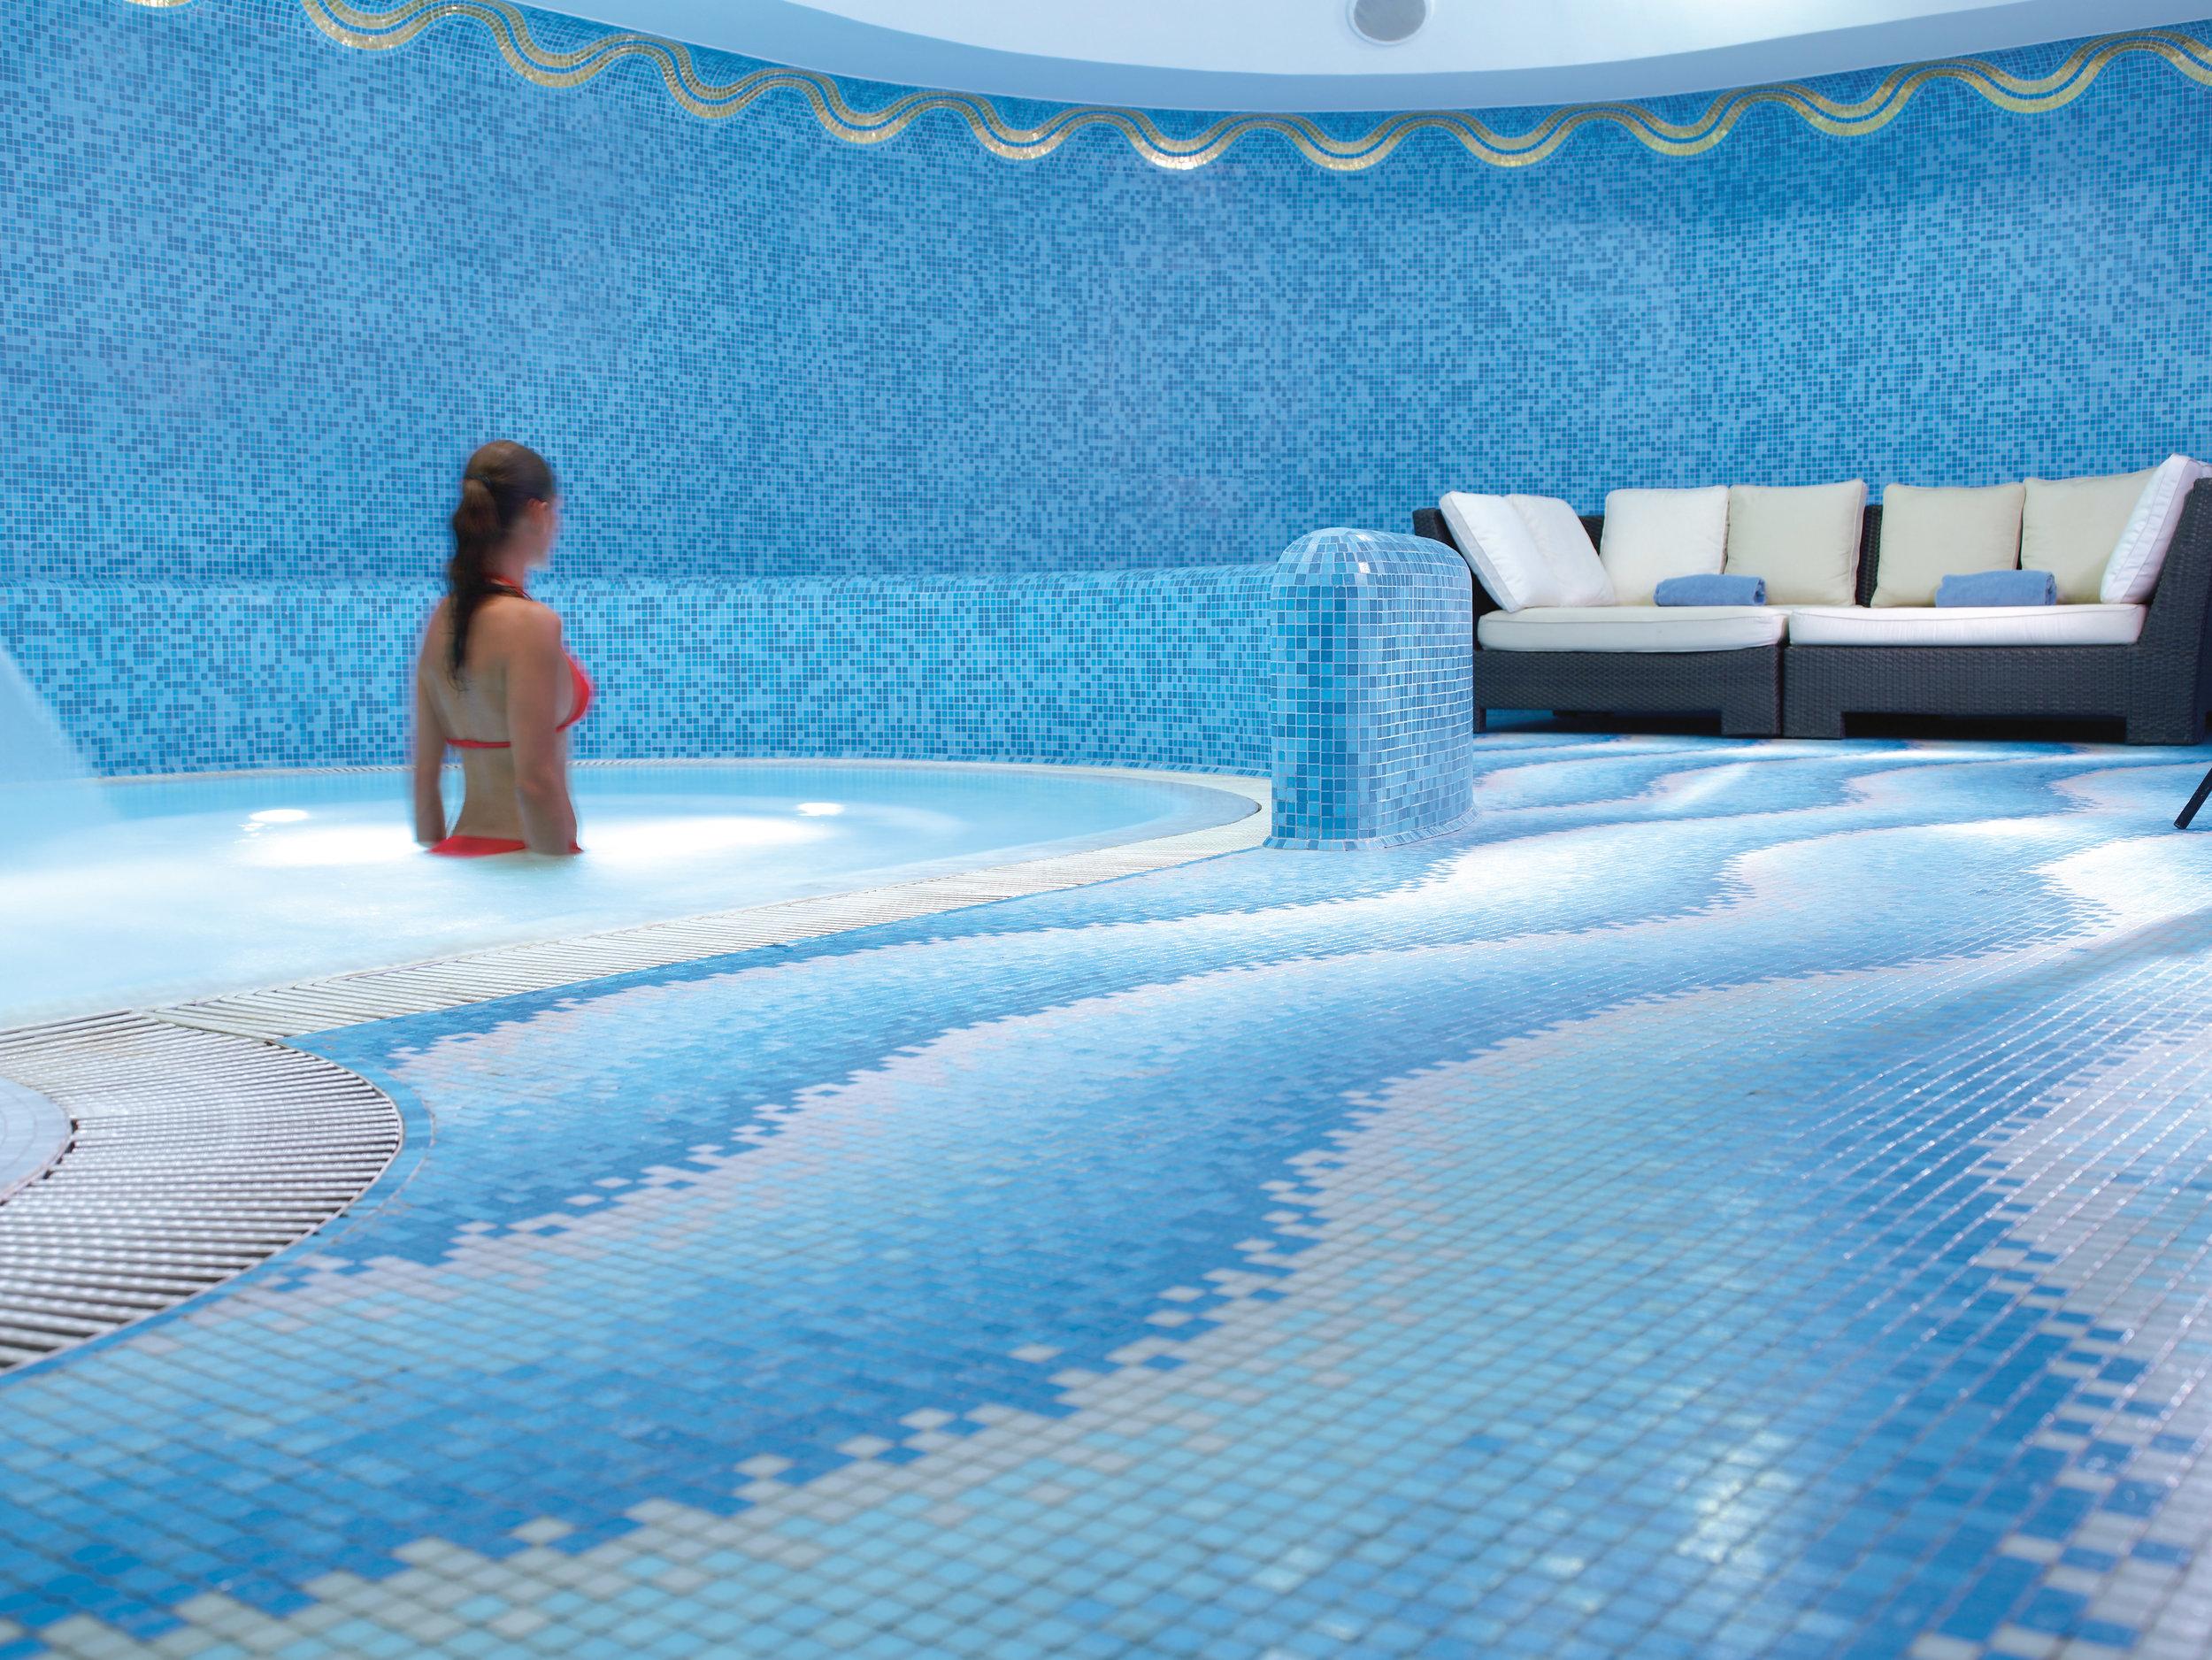 9A RFH Hotel de Russie - De Russie Wellness Zone Jacuzzi Sep 07 A Houston.jpg